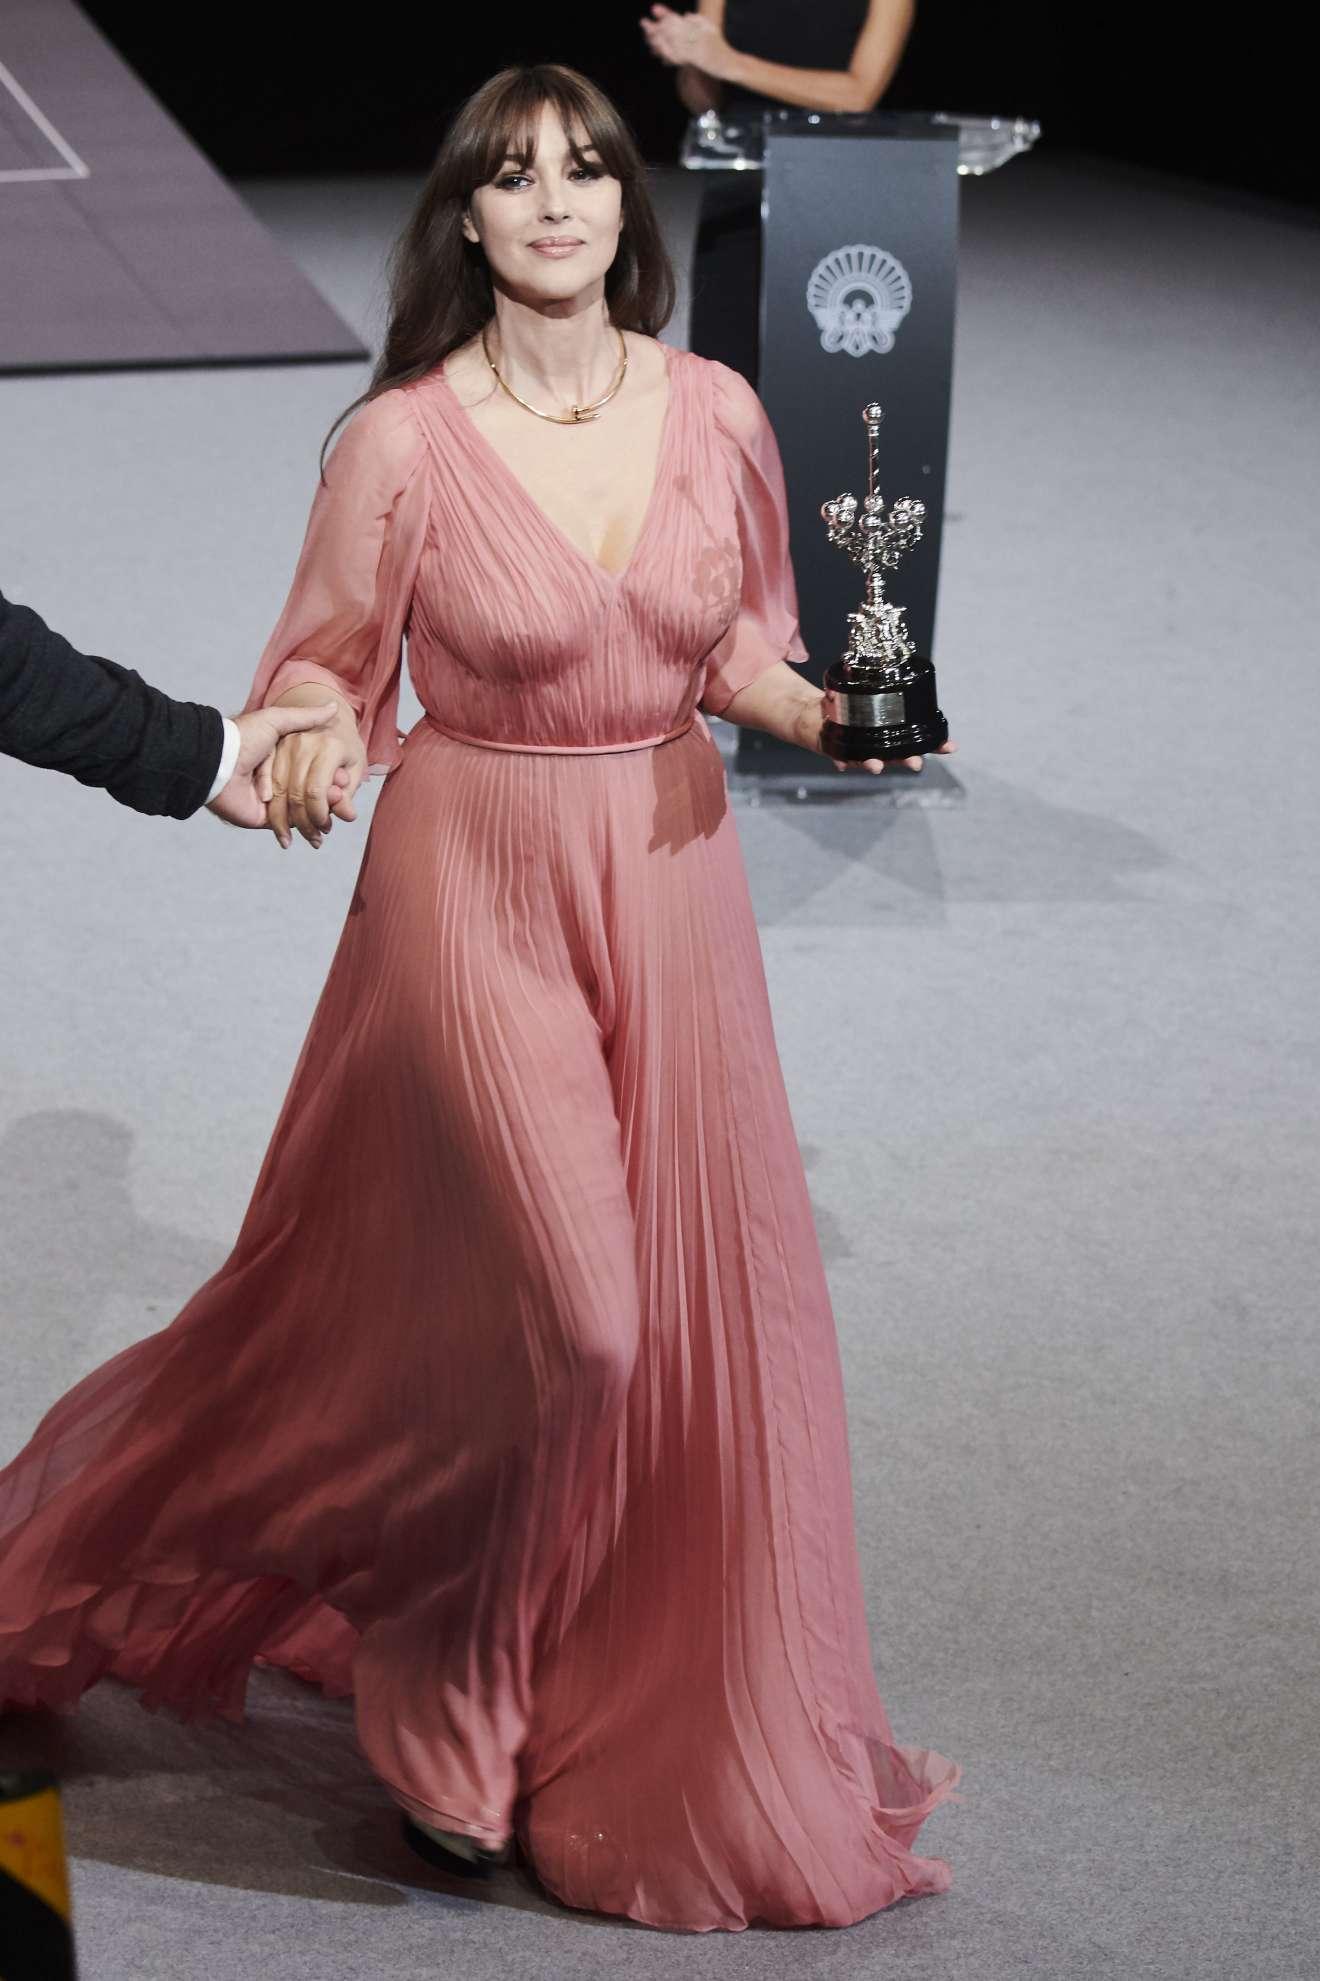 Monica Bellucci Donostia Award 2017 San Sebastian Film Festival Celebs By Lianxio